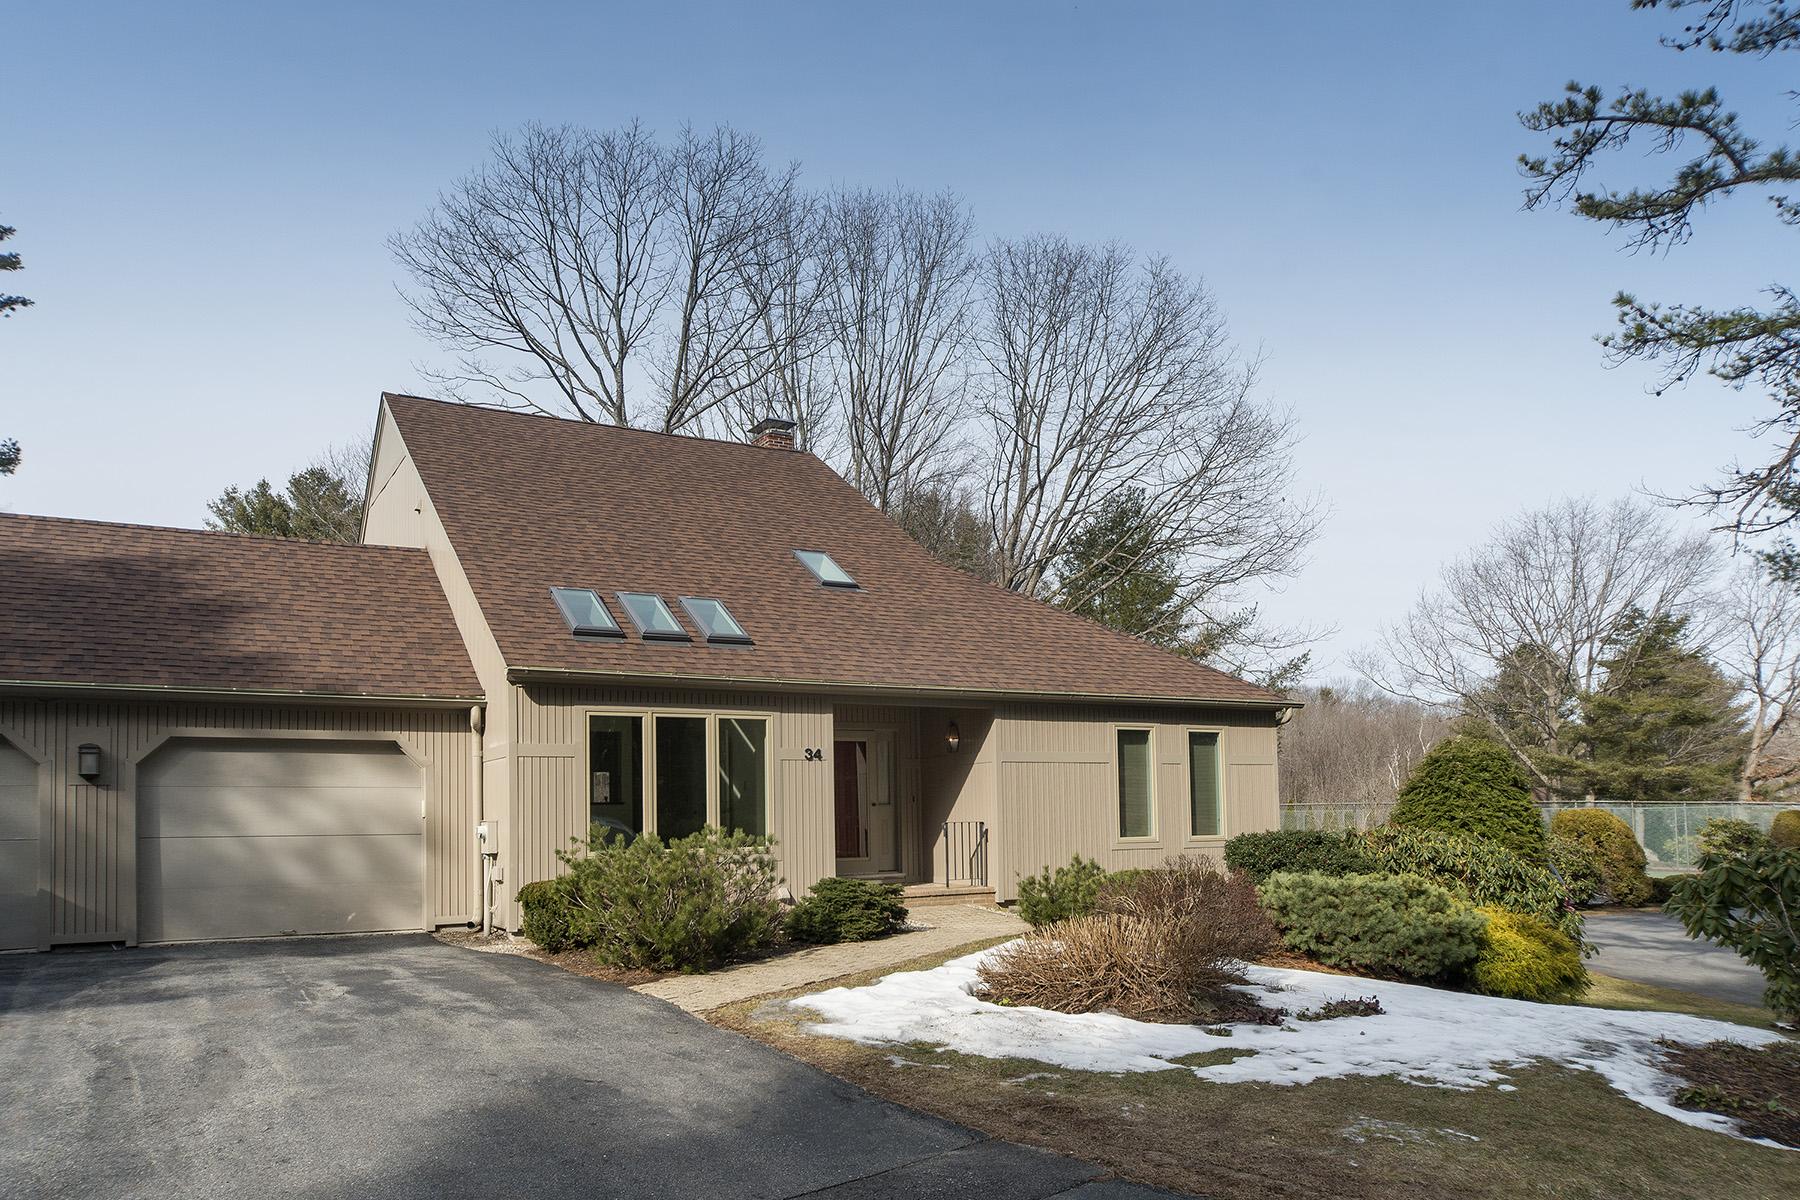 Condominium for Sale at 34 Wildwood Drive 34 Wildwood Drive Unit 34 Cape Elizabeth, Maine, 04107 United States